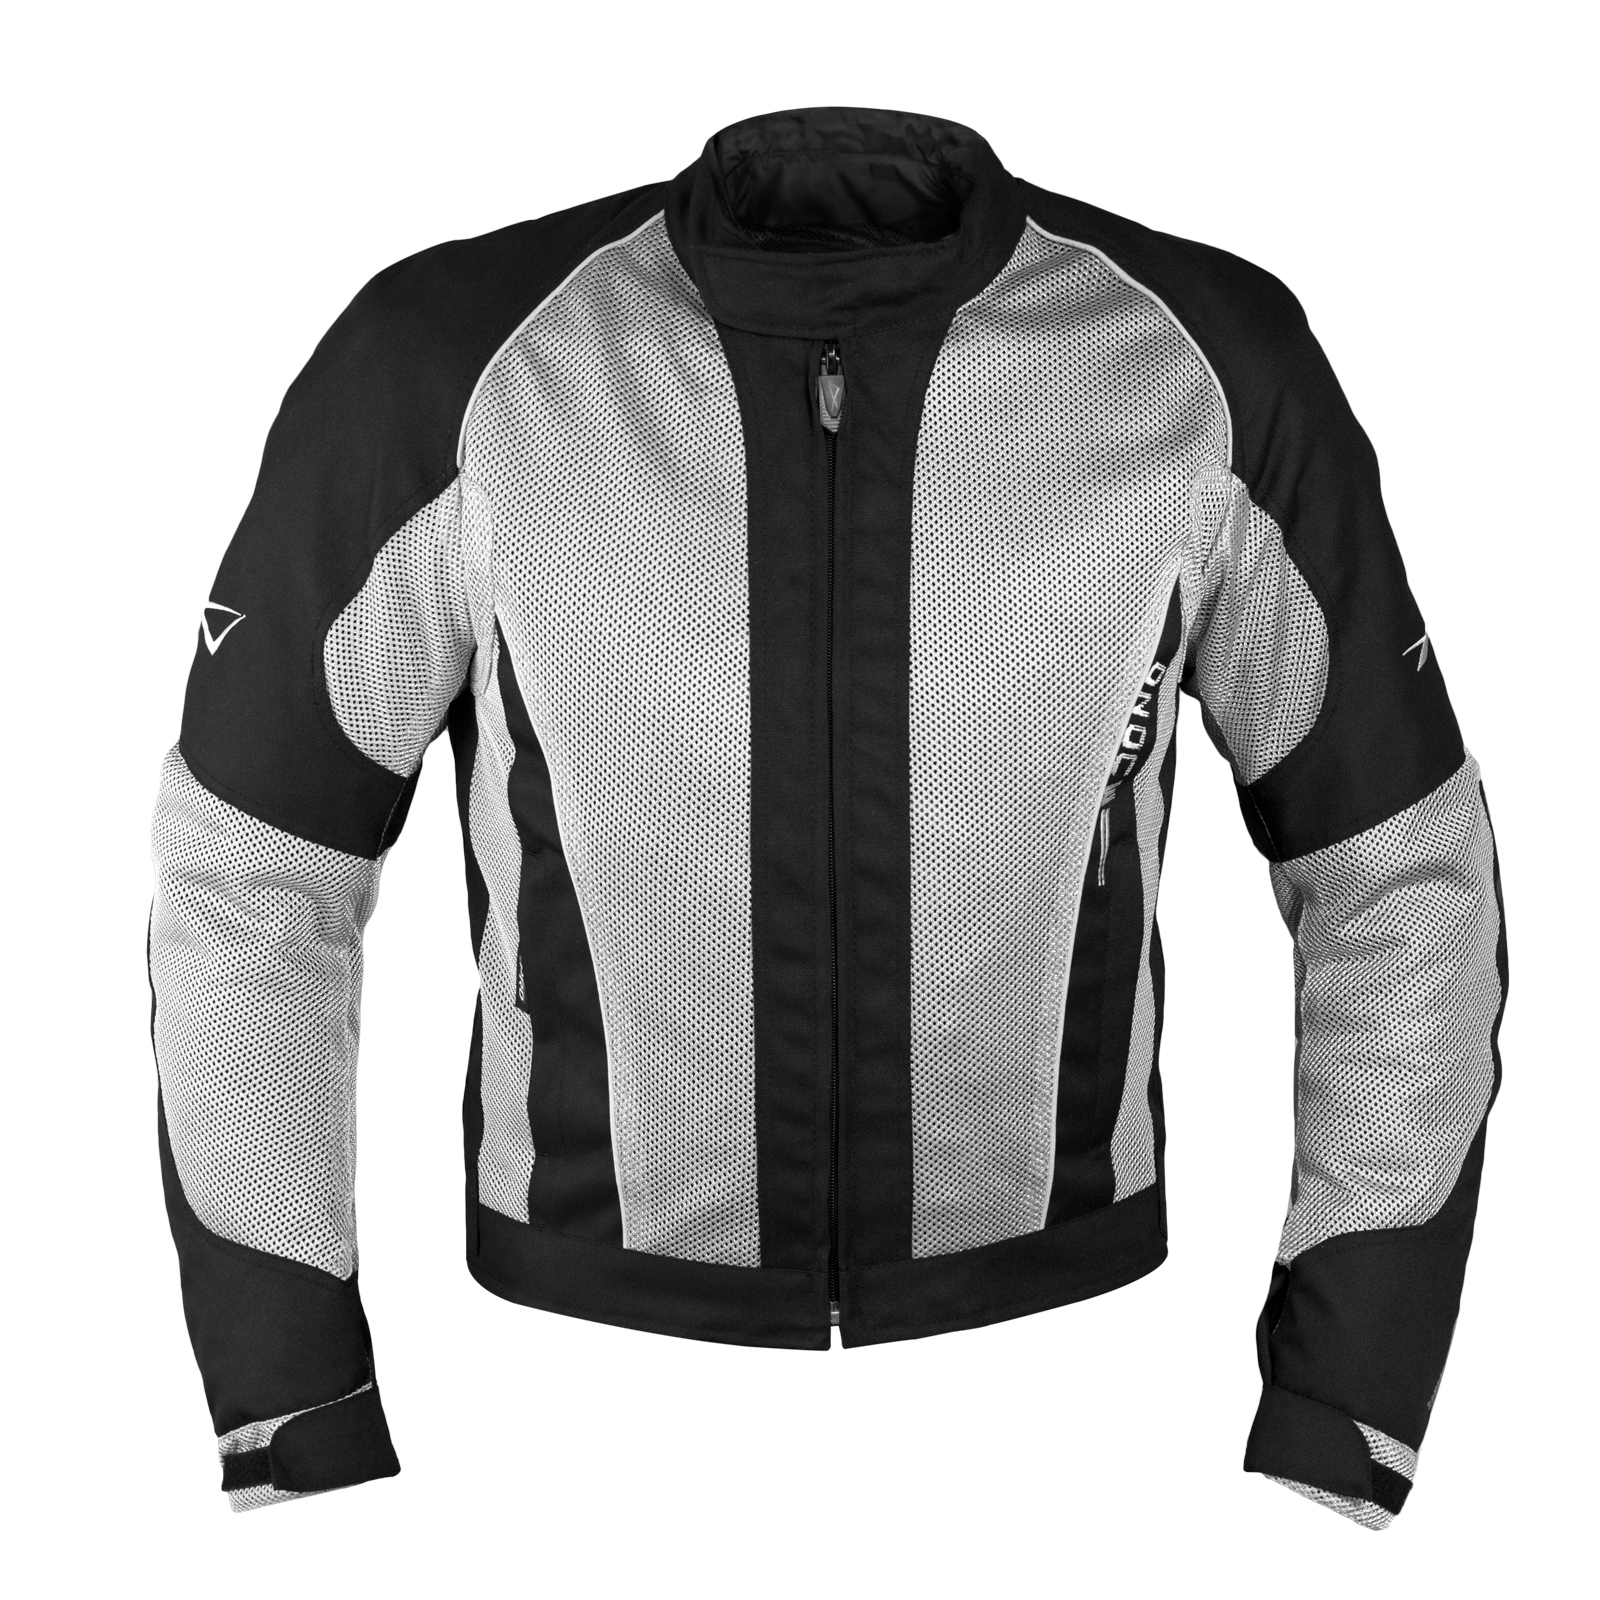 Giacca-Giubbino-Mesh-Traforato-Traspirante-Tessuto-Tecnico-Moto-Sport-Grigio